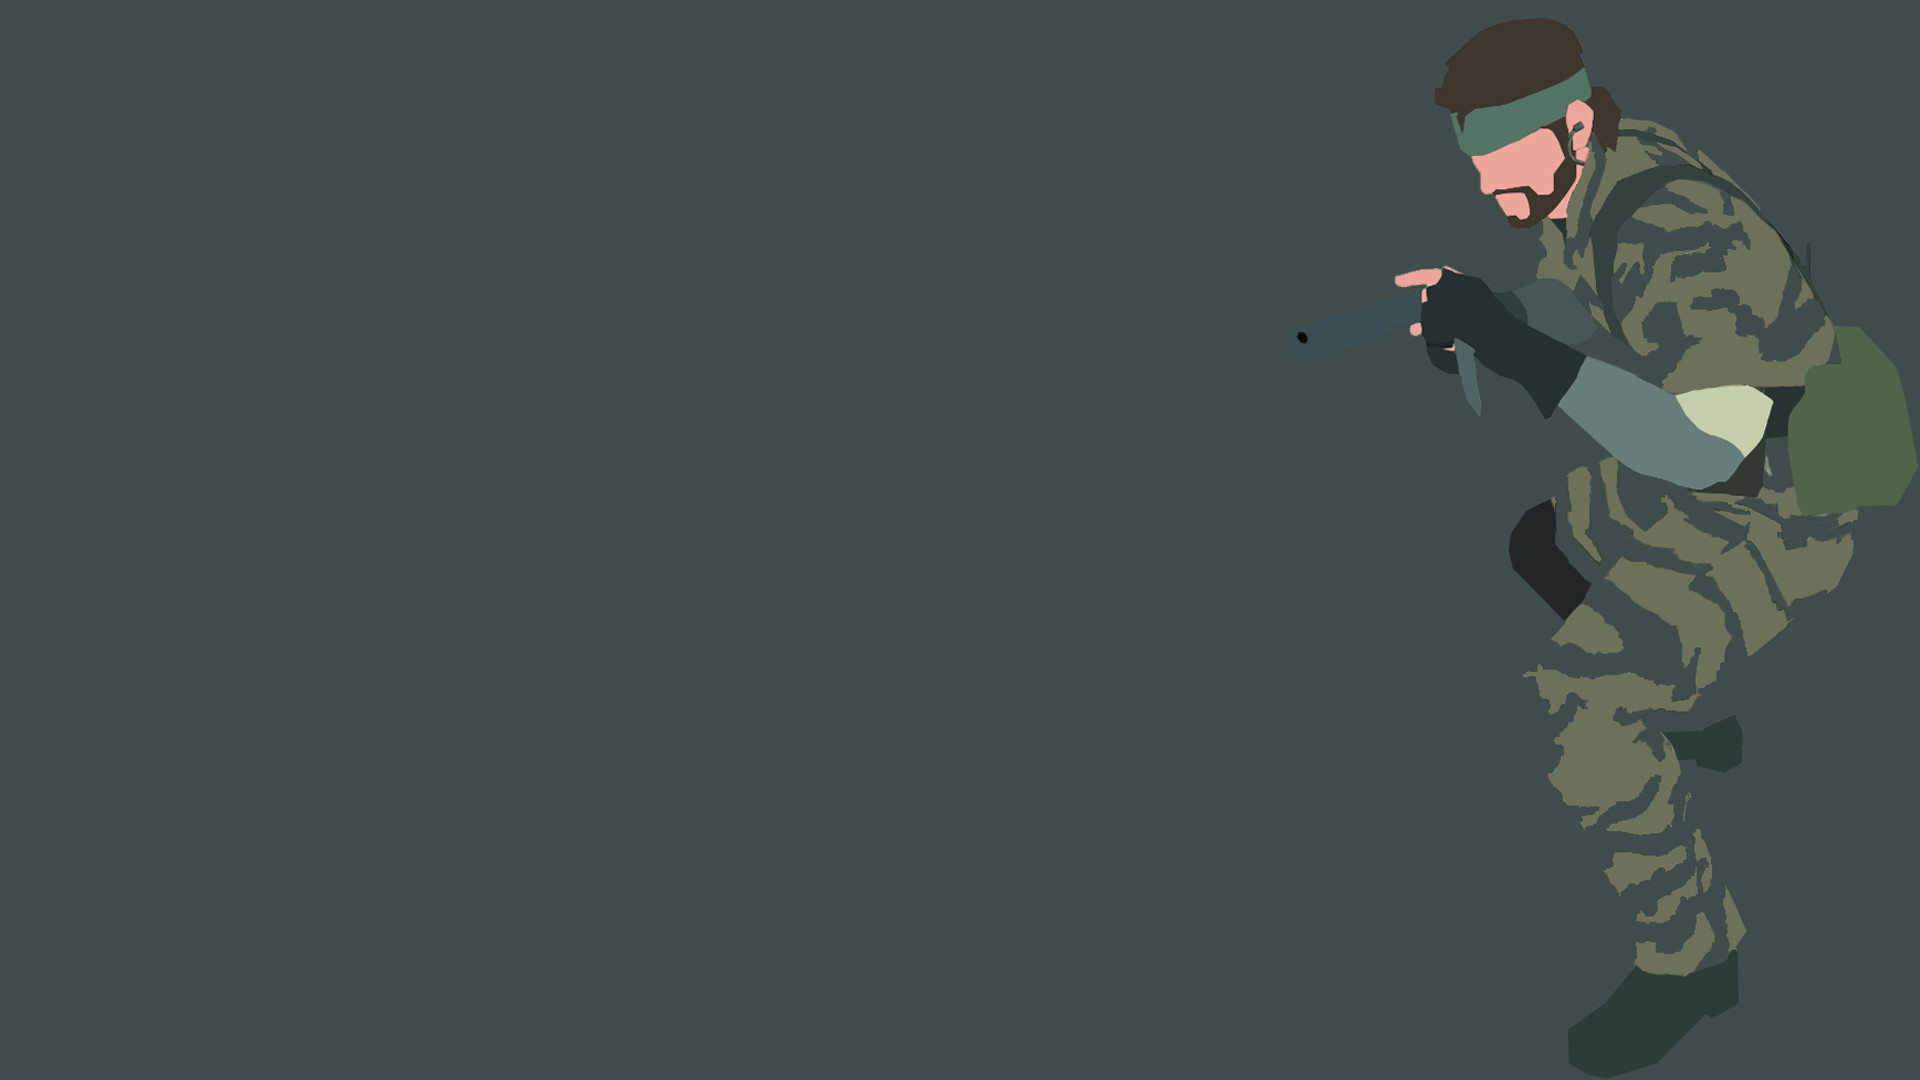 Metal Gear Solid Wallpapers Full High Resolution Metal Gear